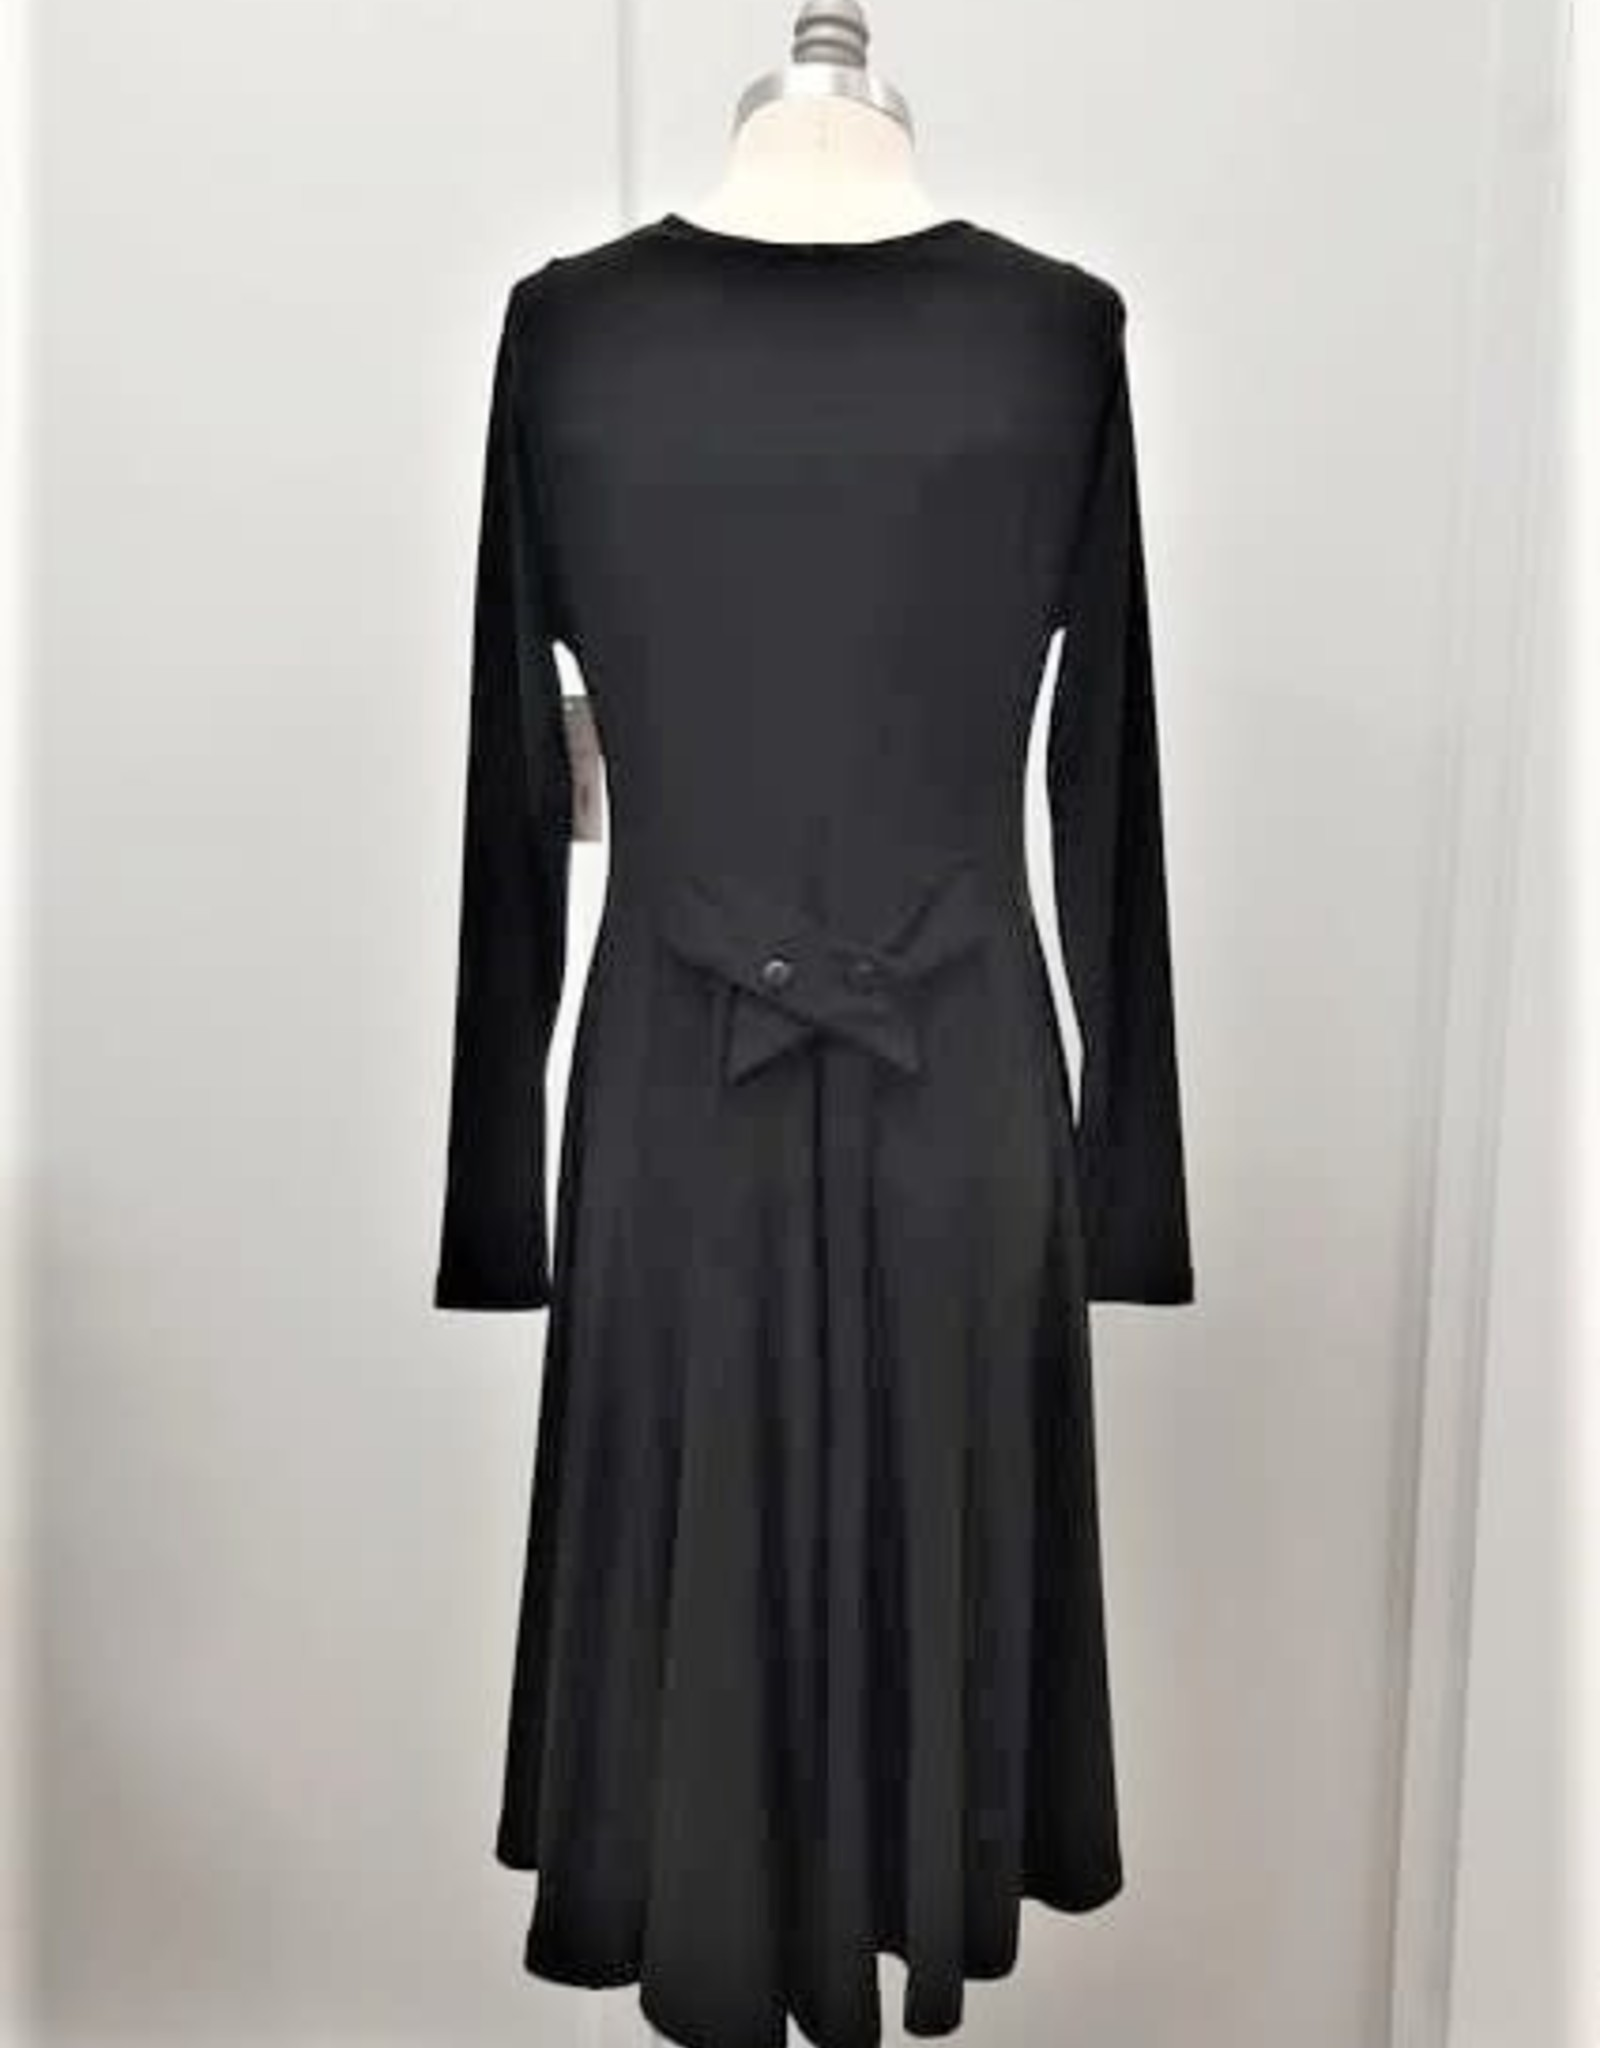 Sympli Mystic Jacket - Size 8 (Consignment)